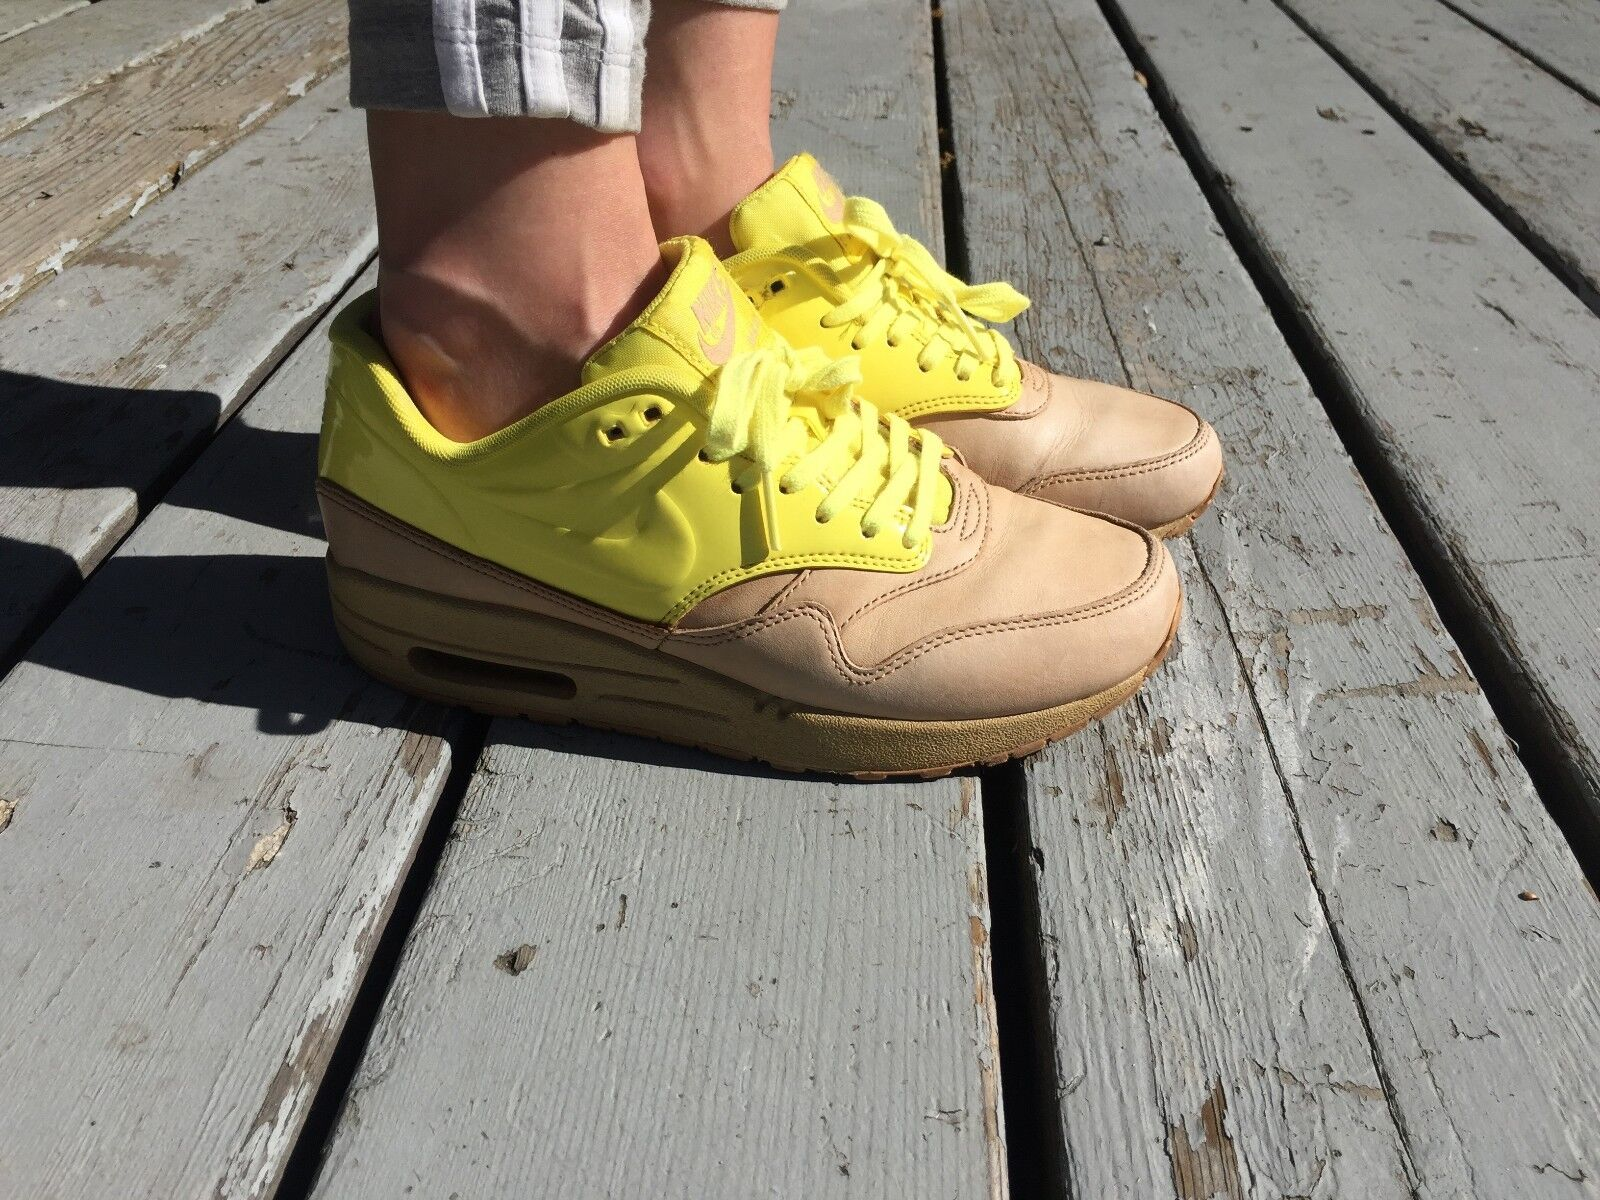 Women's Nike Air Max 1 VT QS Vachetta Tan/Sonic Yellow Athletic Shoes Size 6